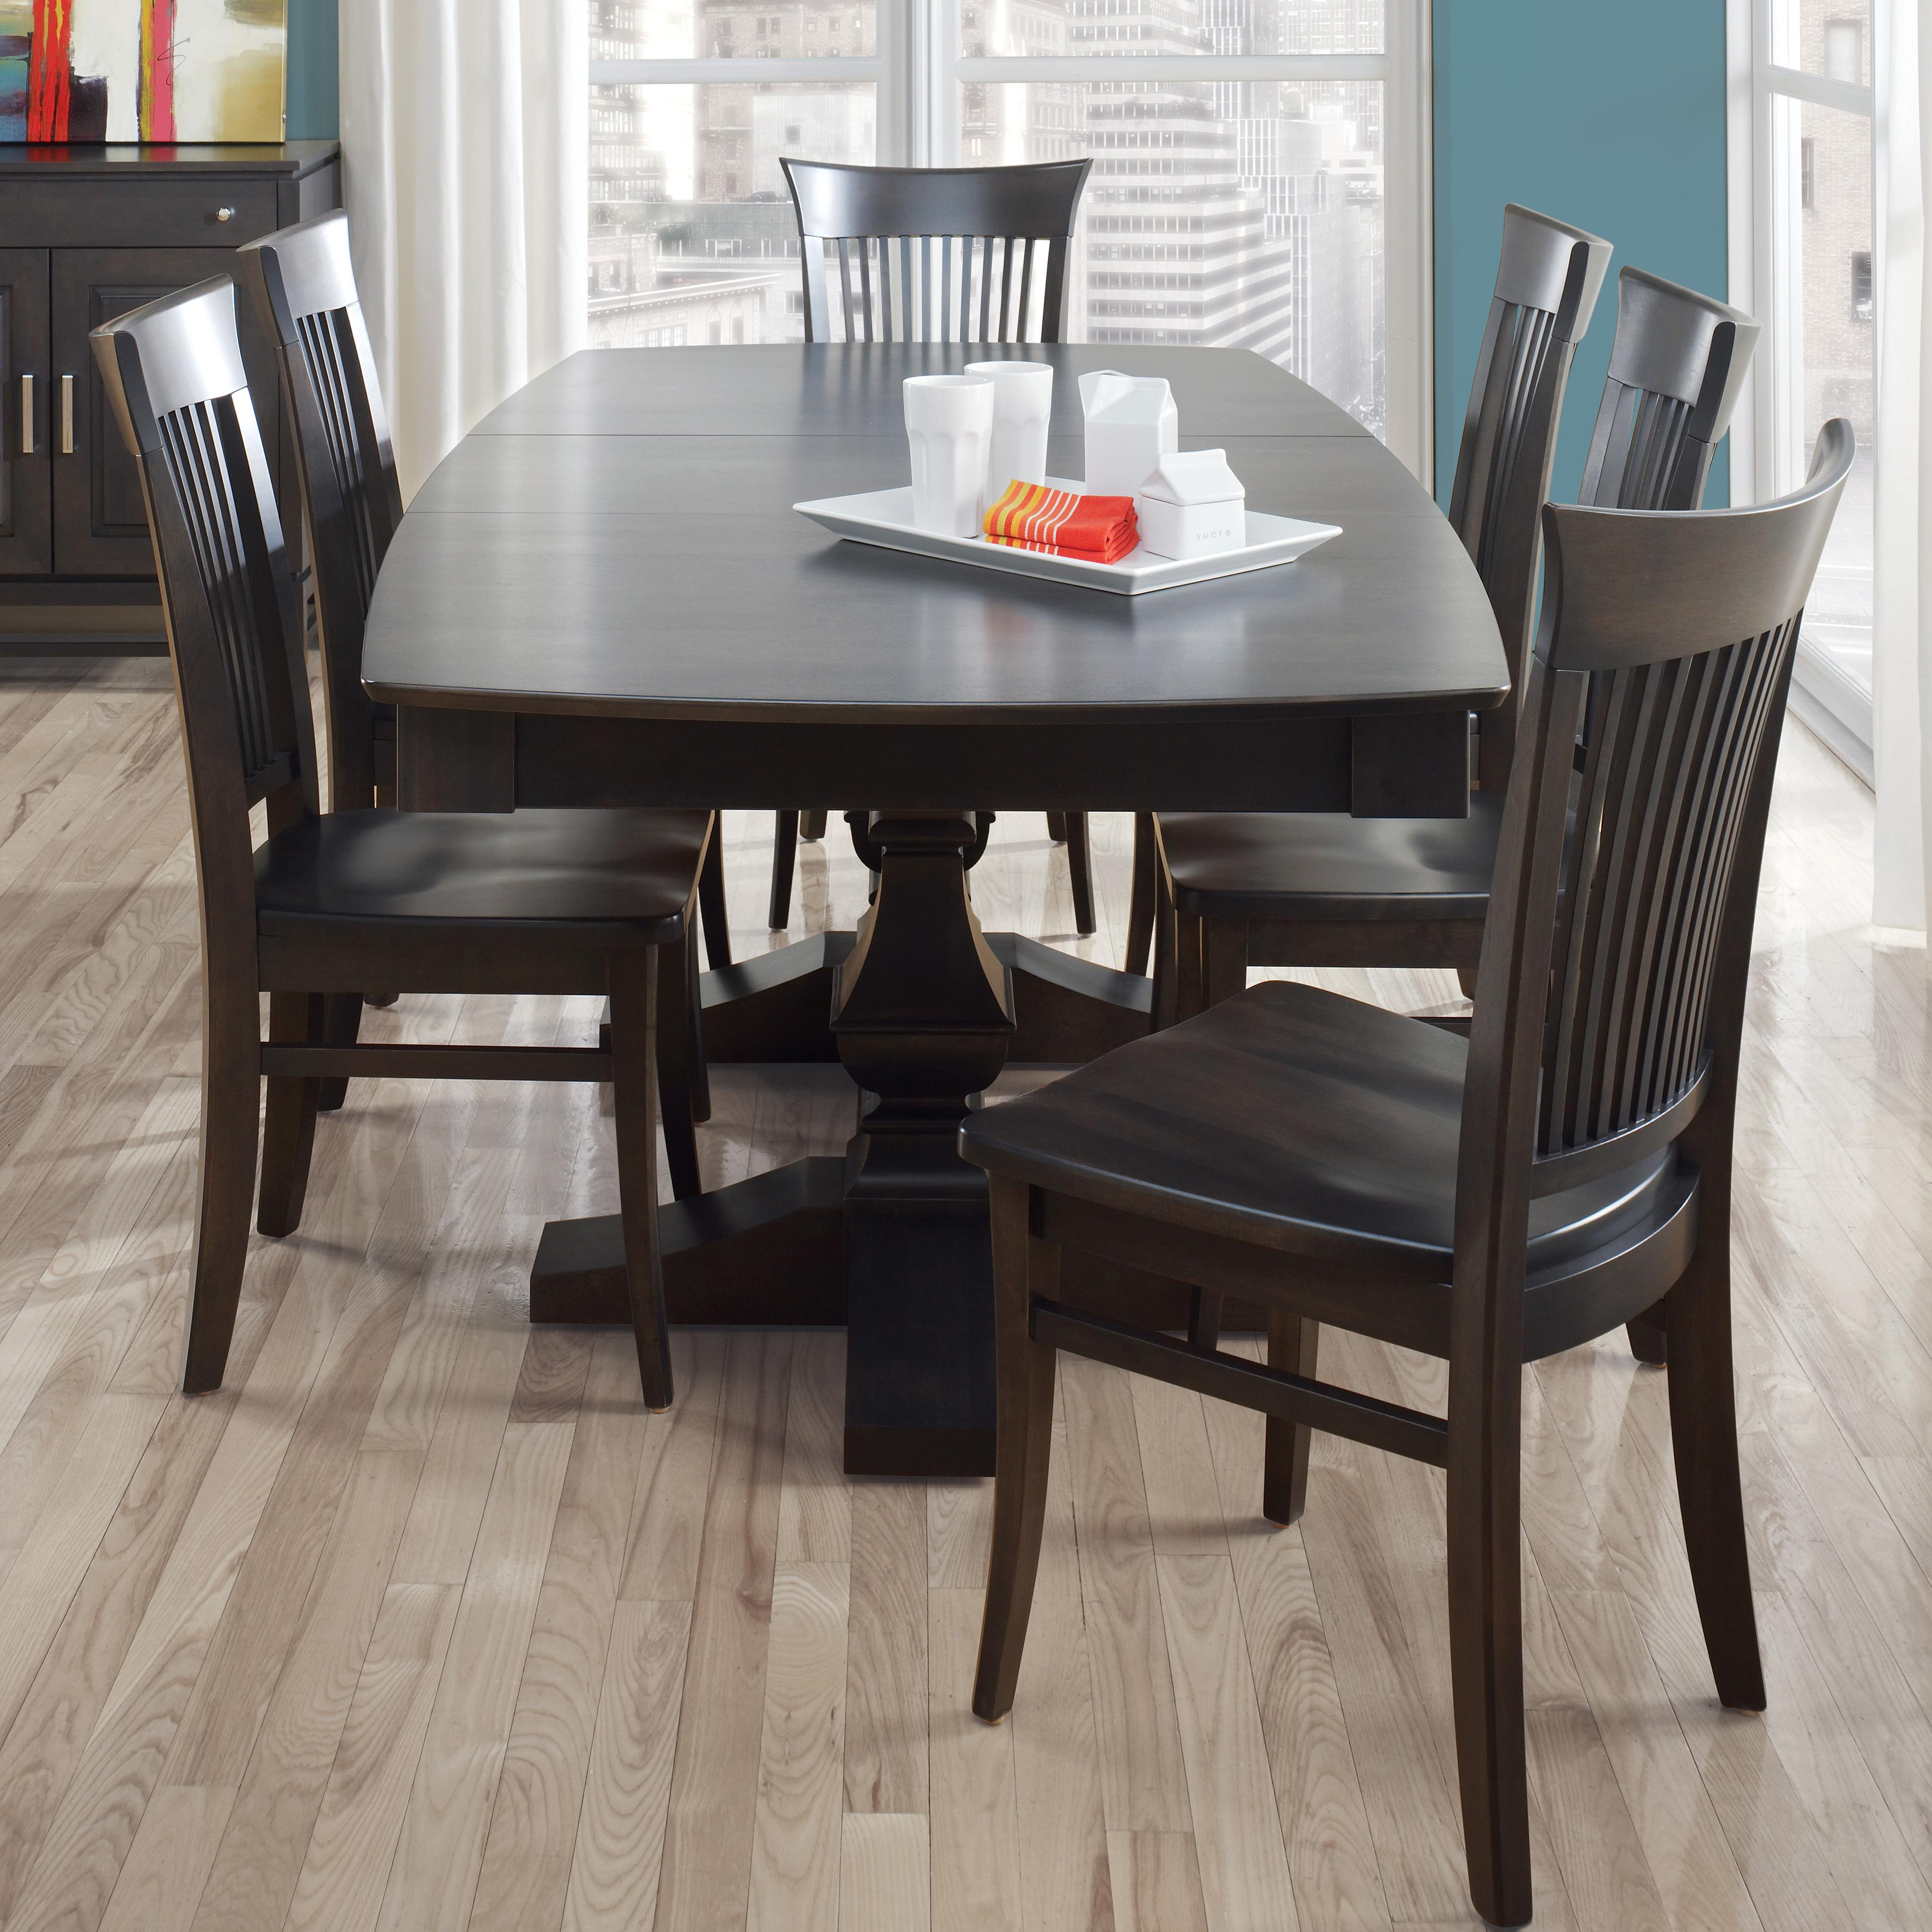 canadel custom dining customizable boat shape table with leaf set becker furniture world. Black Bedroom Furniture Sets. Home Design Ideas